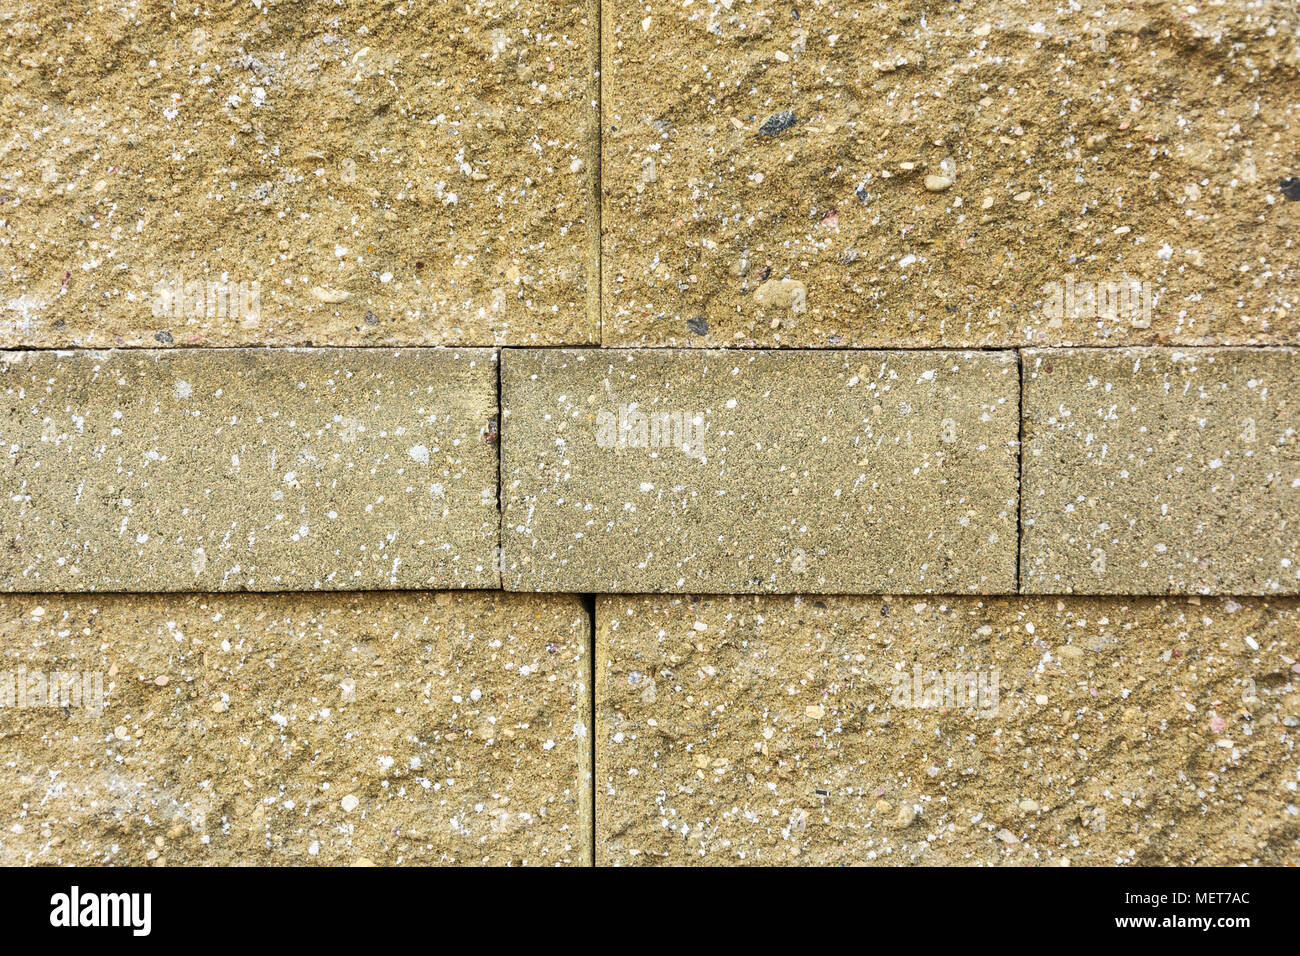 Decorative Bricks Stock Photos & Decorative Bricks Stock Images - Alamy